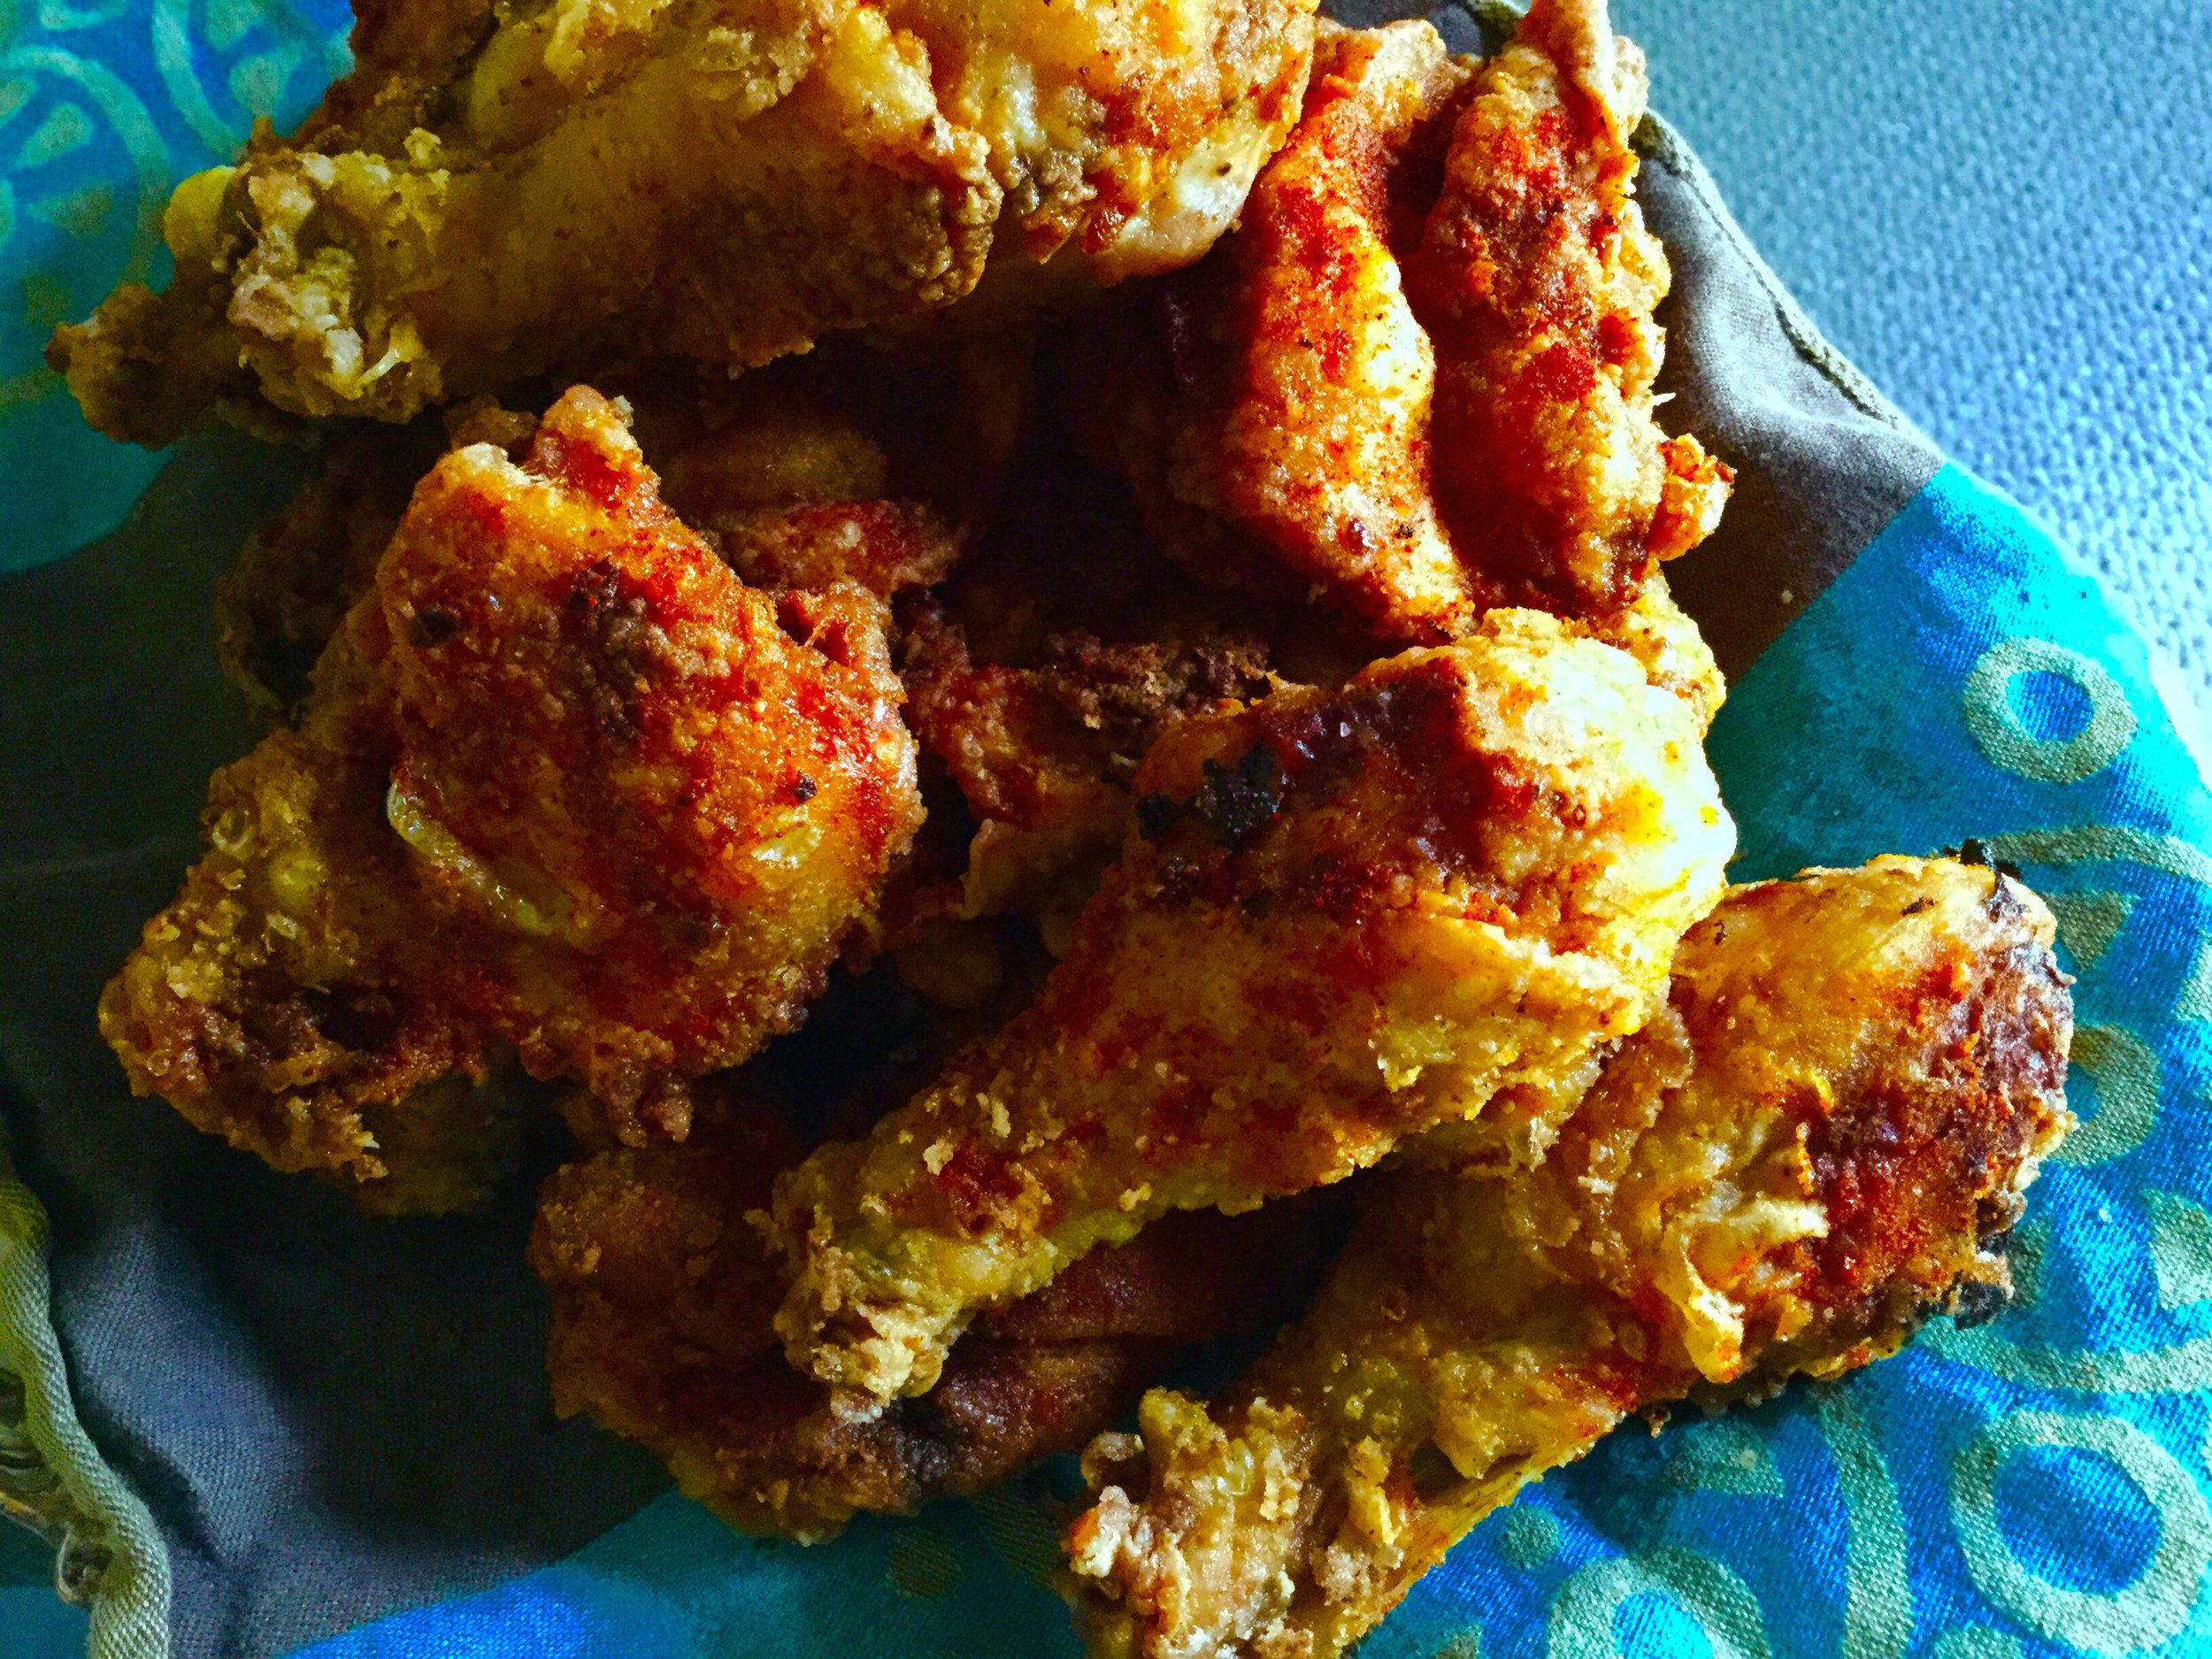 Mariby Corpening's Peruvian-Spiced Fried Chicken